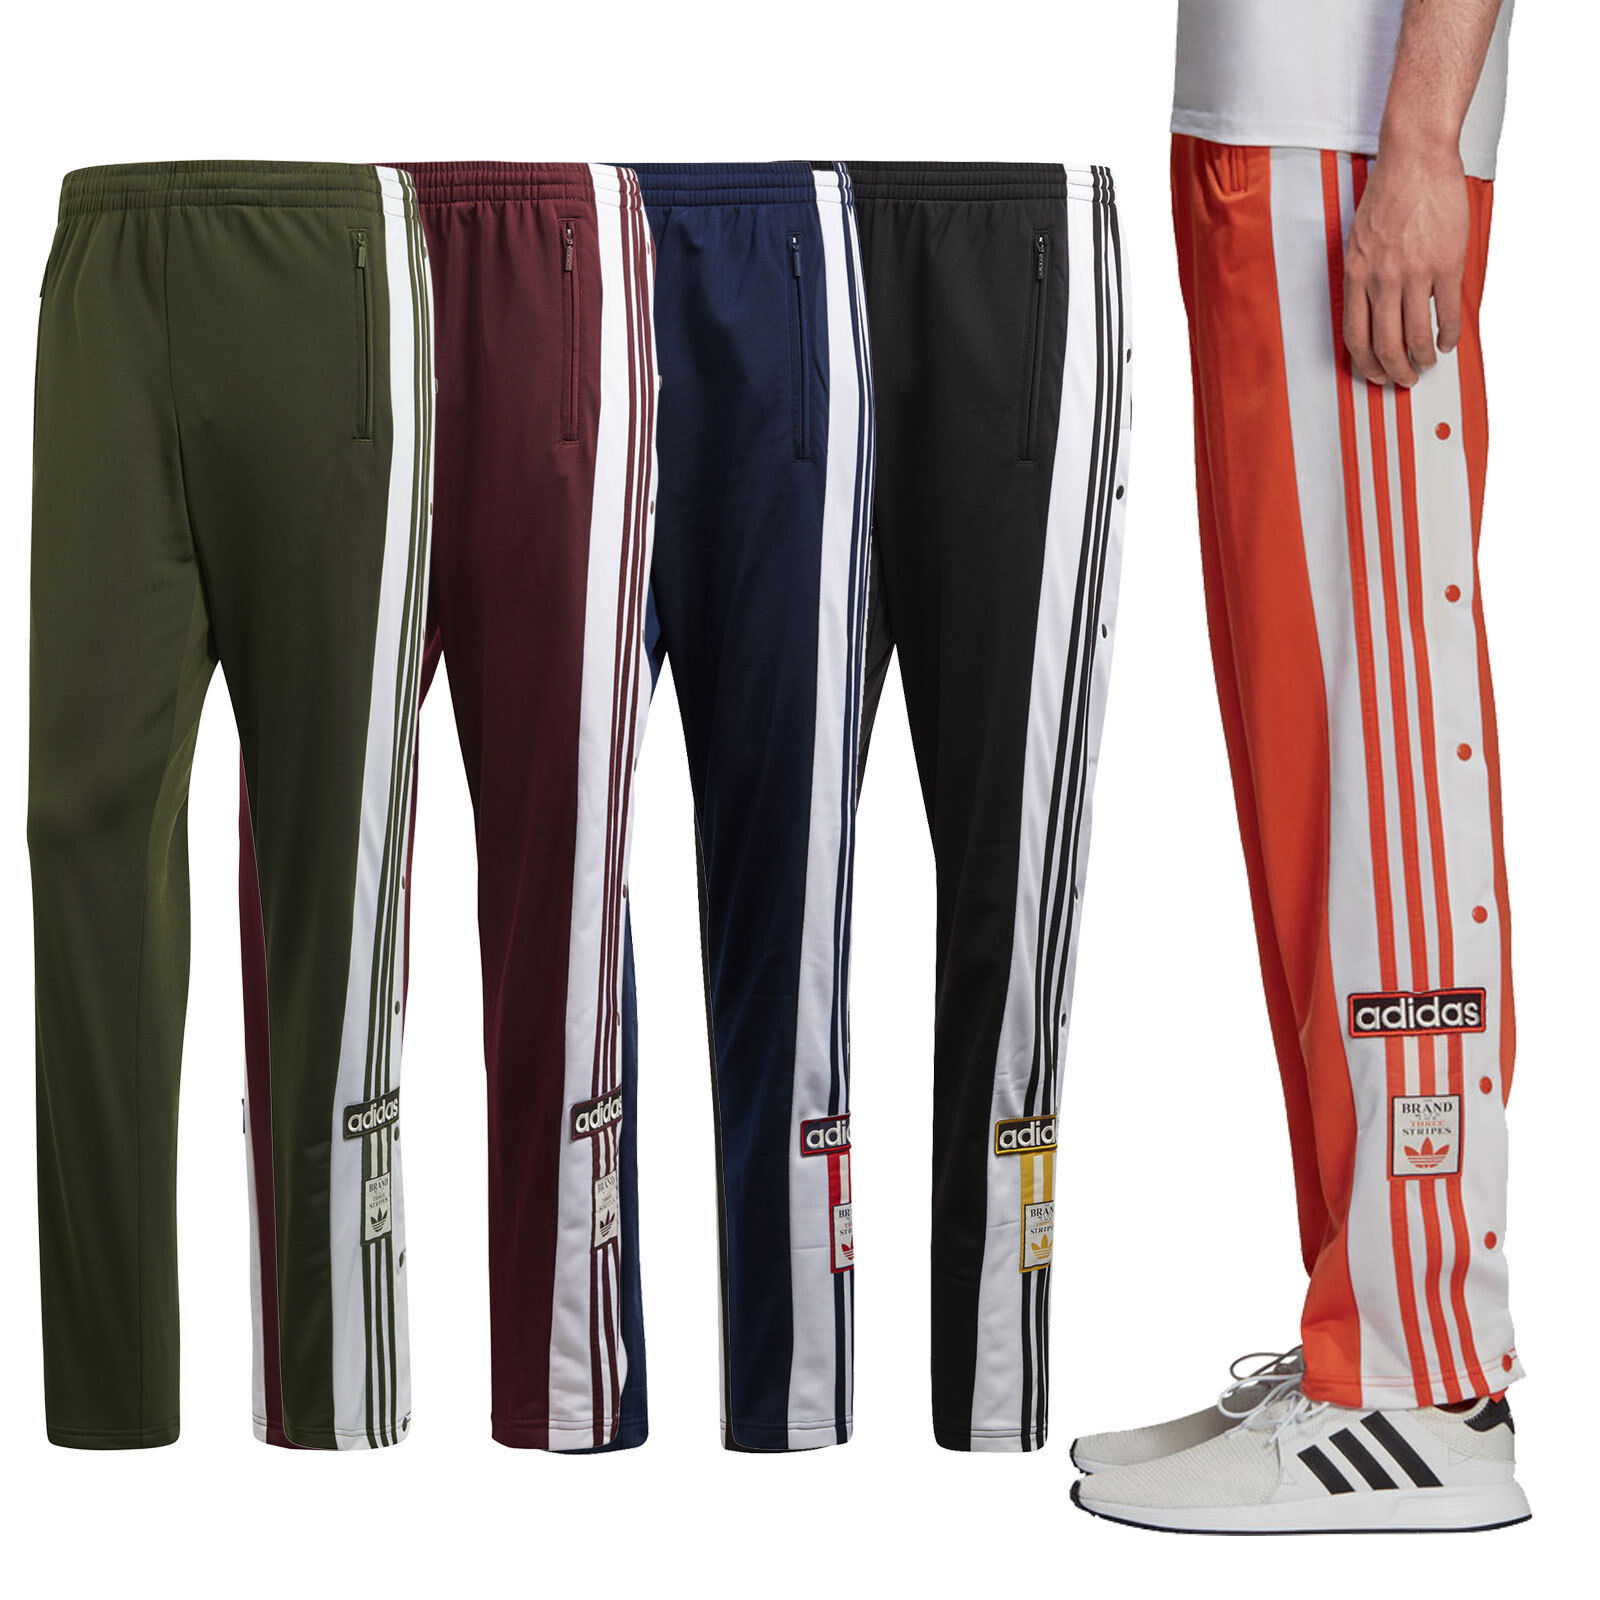 a5a6bff8ce6570 adidas Originals Adibreak Trackpant Herren Freizeit Trainings-Hose  Jogginghose